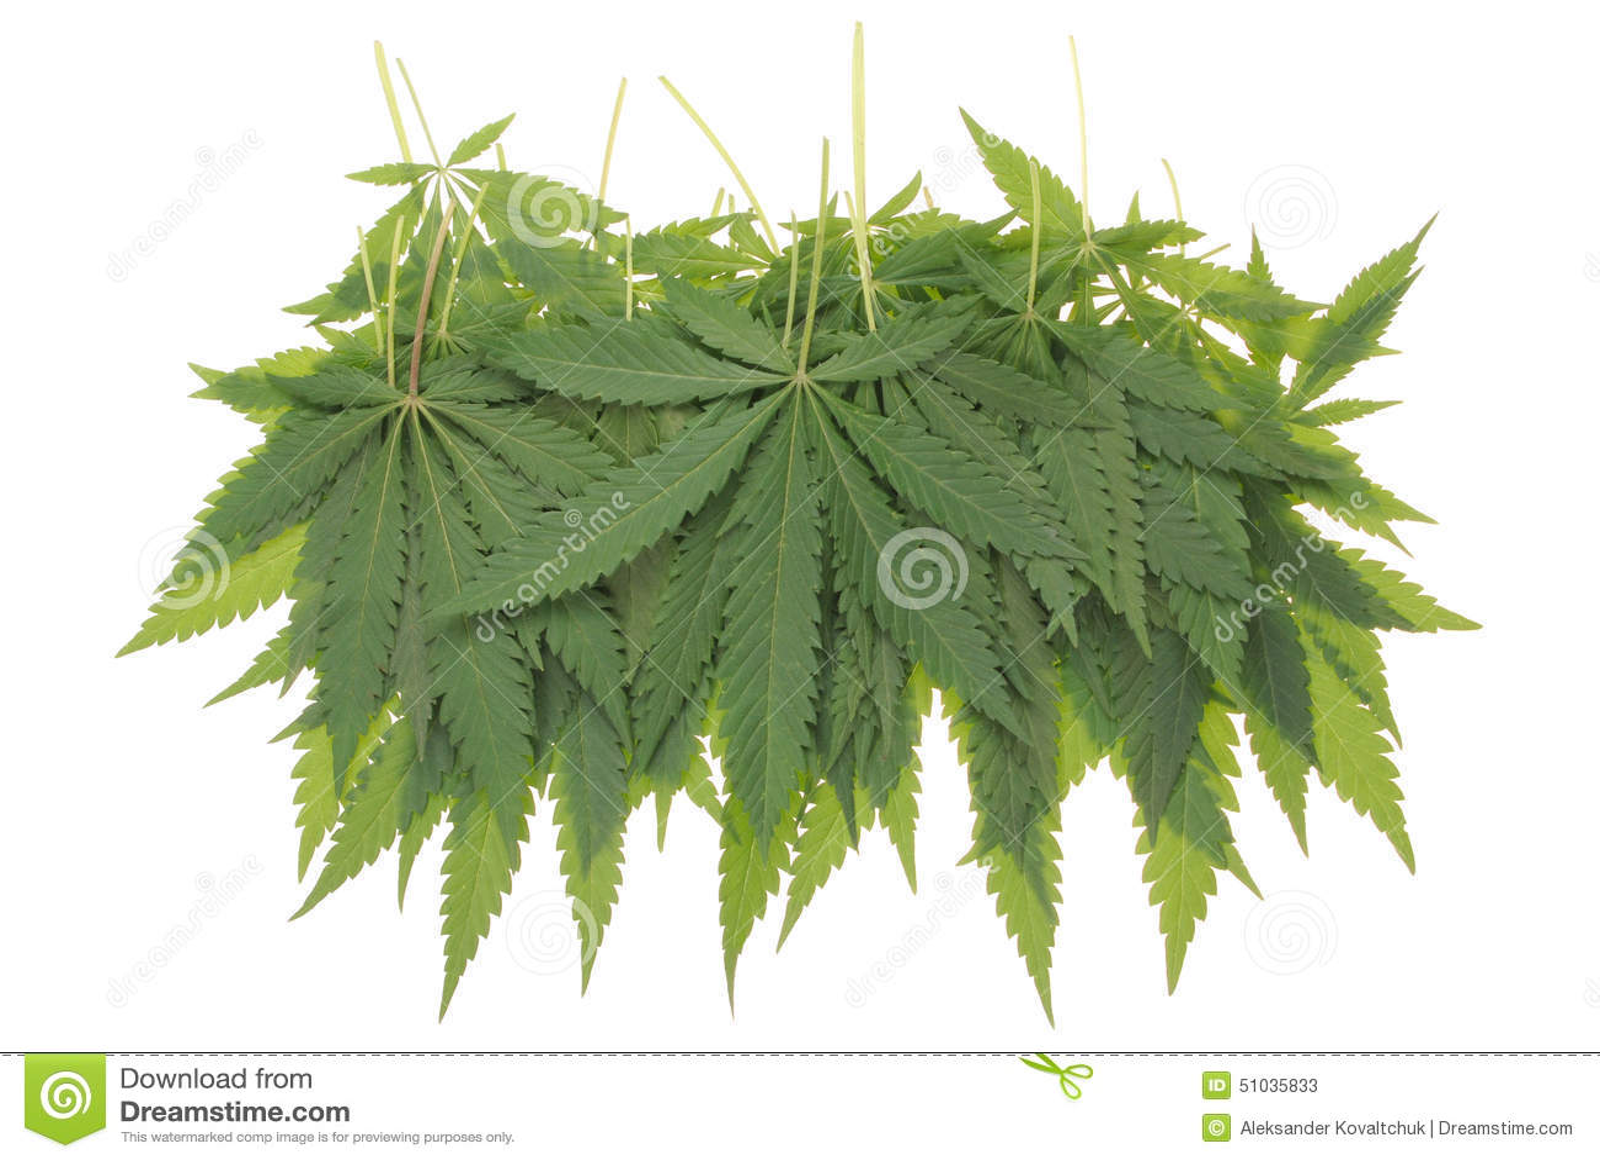 Konopie (marihuany)